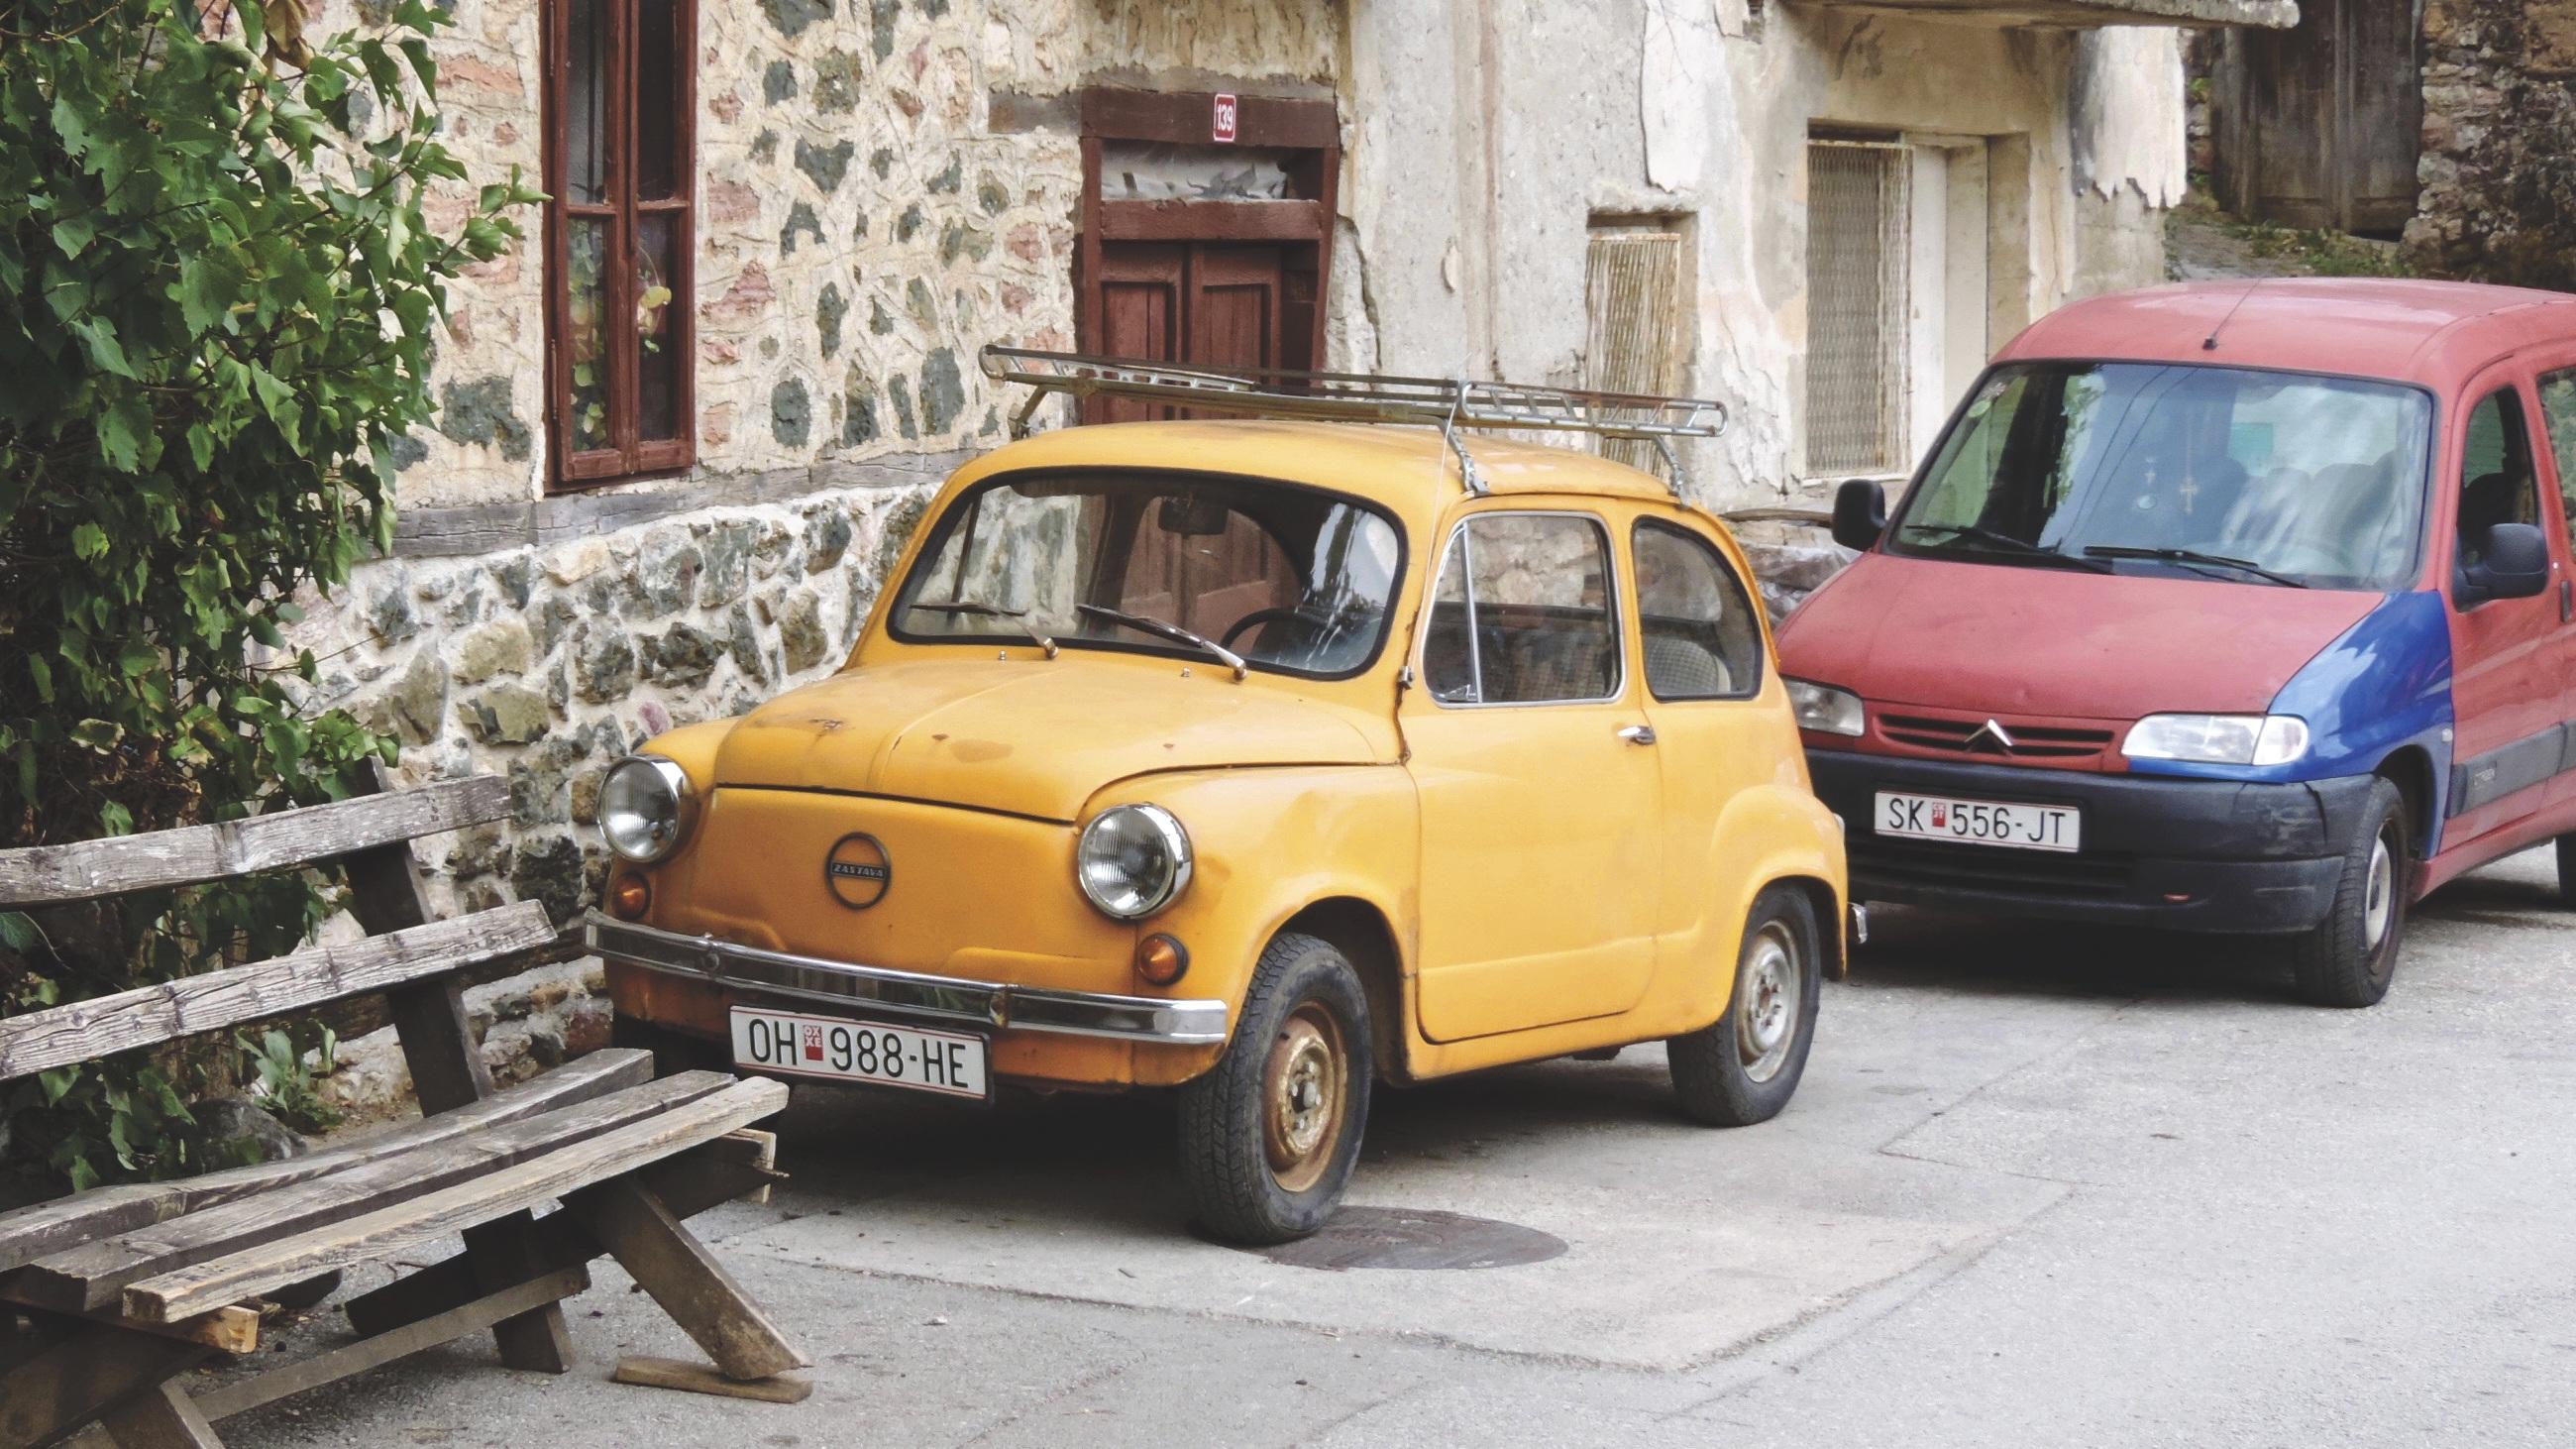 Bench Car Vintage Old Vehicle Cars Clic Antique City Land Automobile